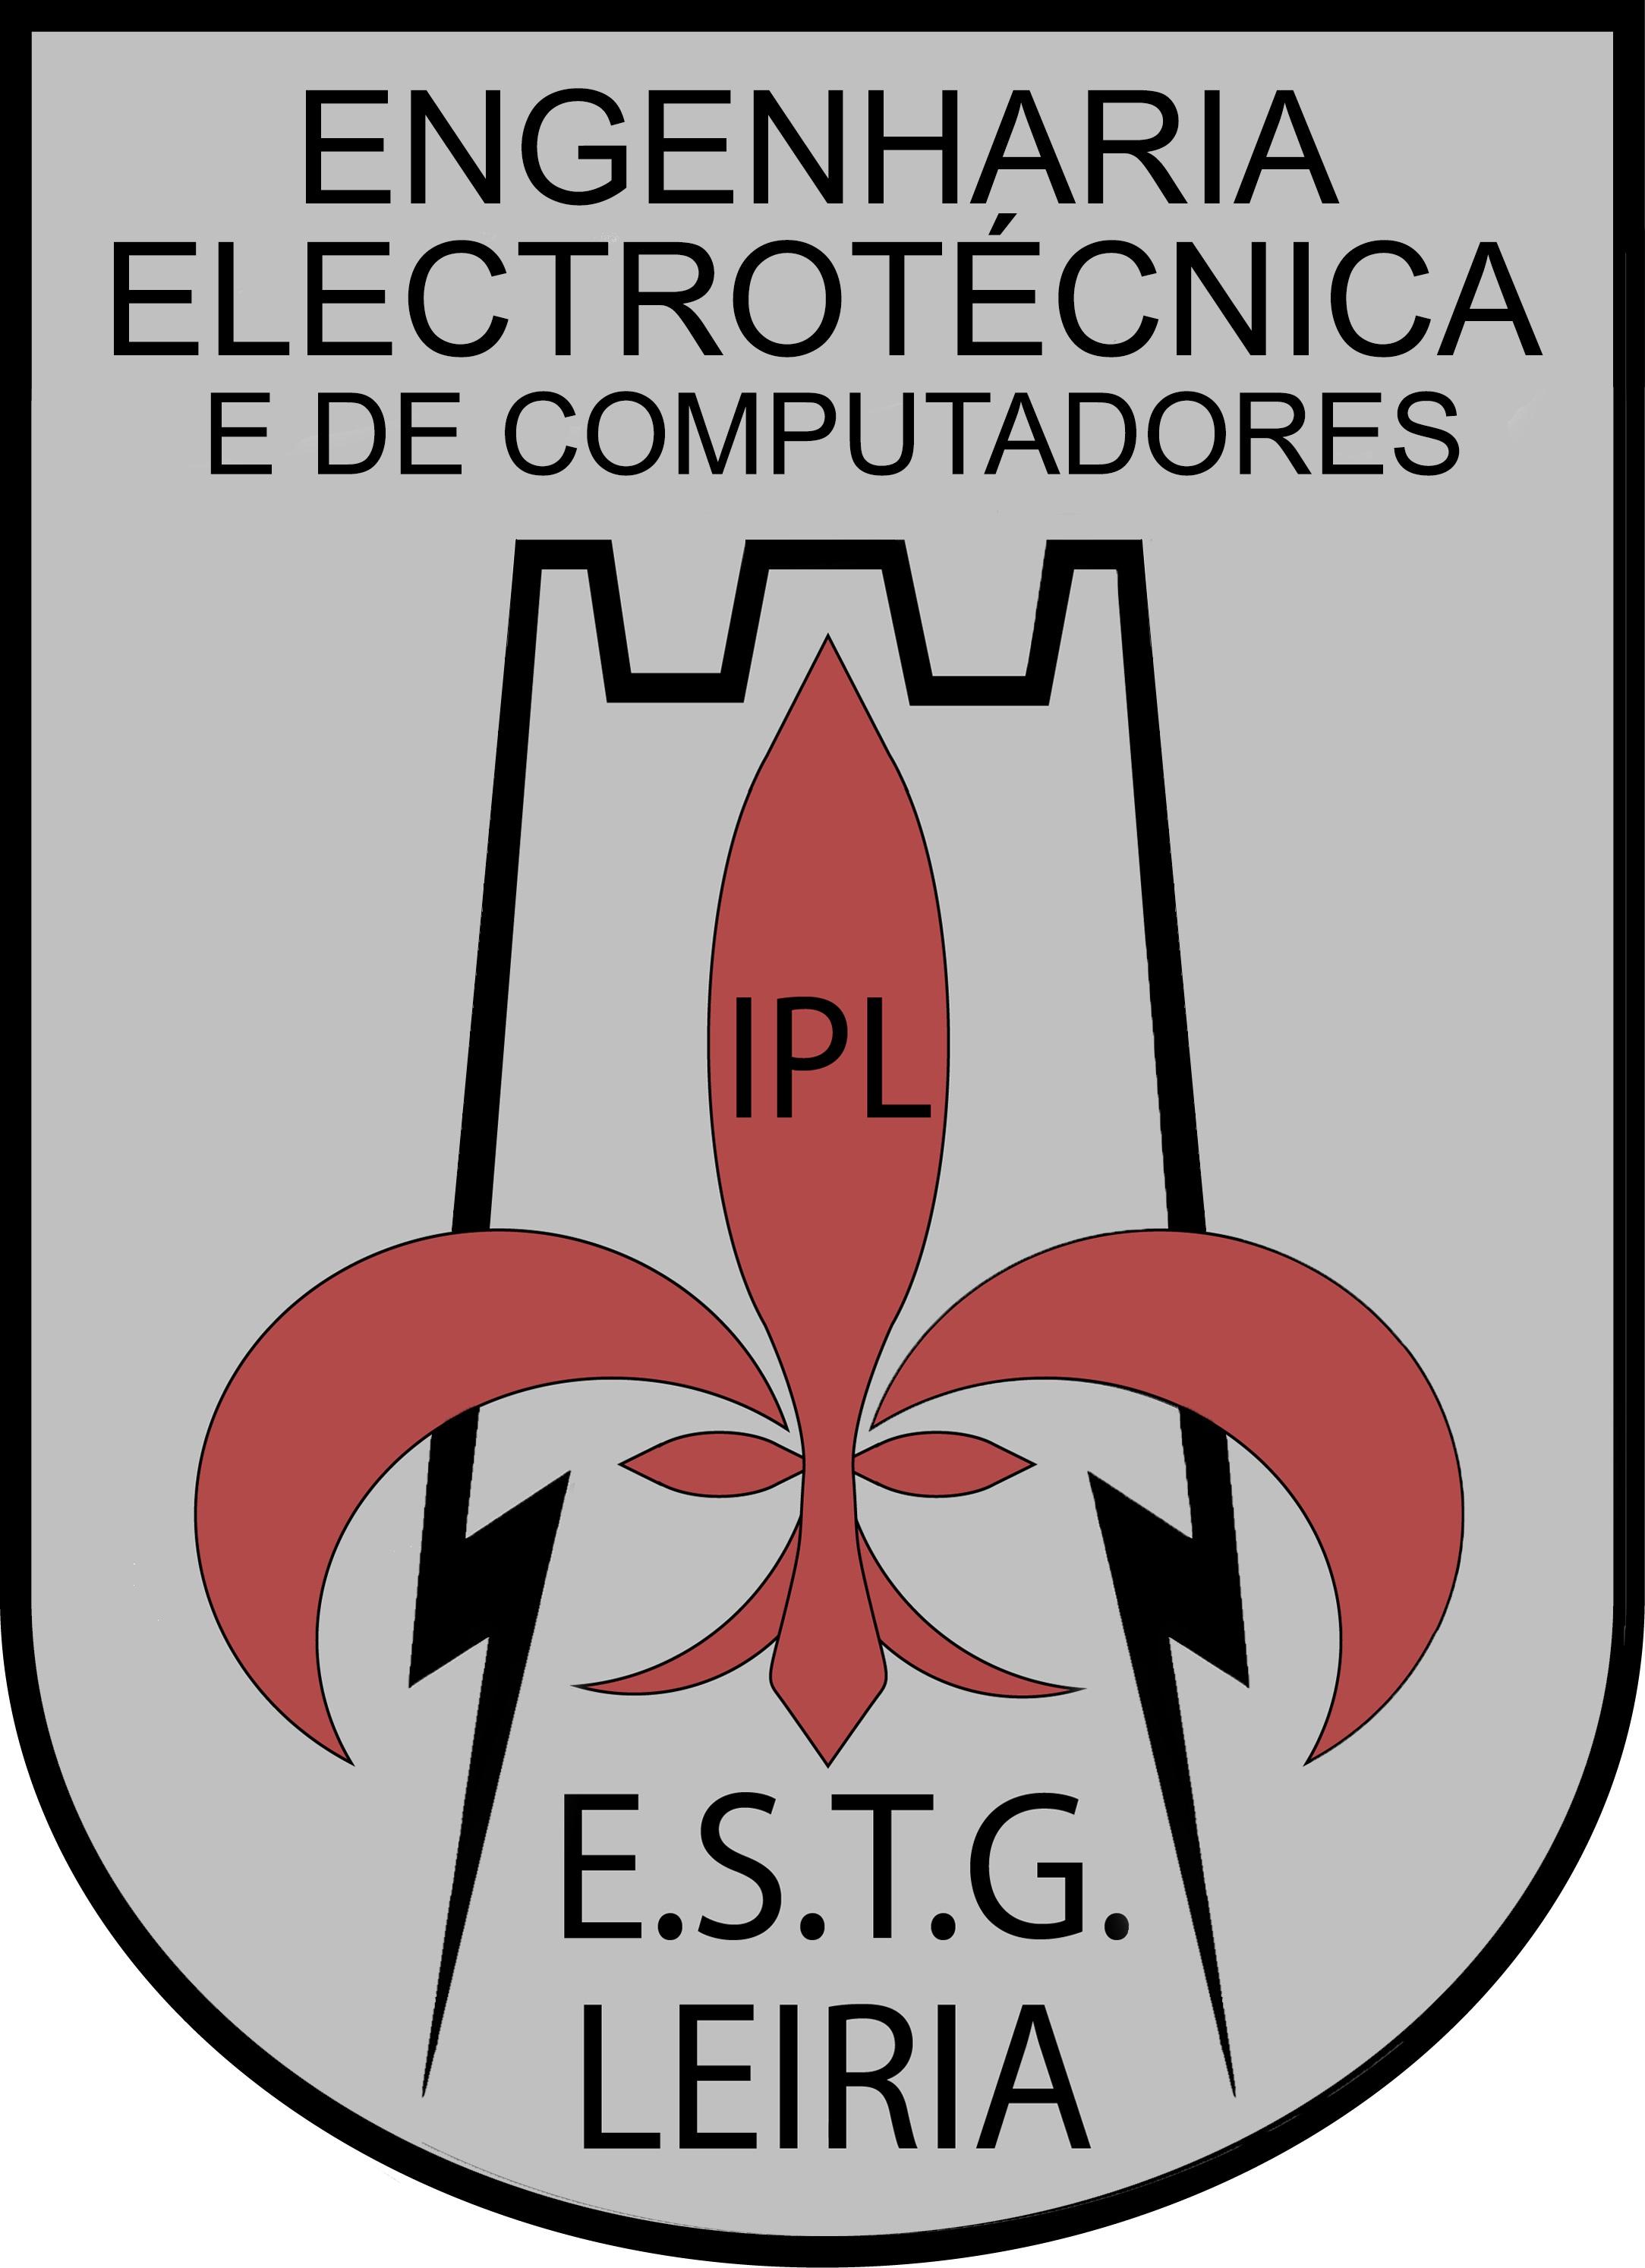 Simbolo_EE_NOVO_final_2_grande.jpg